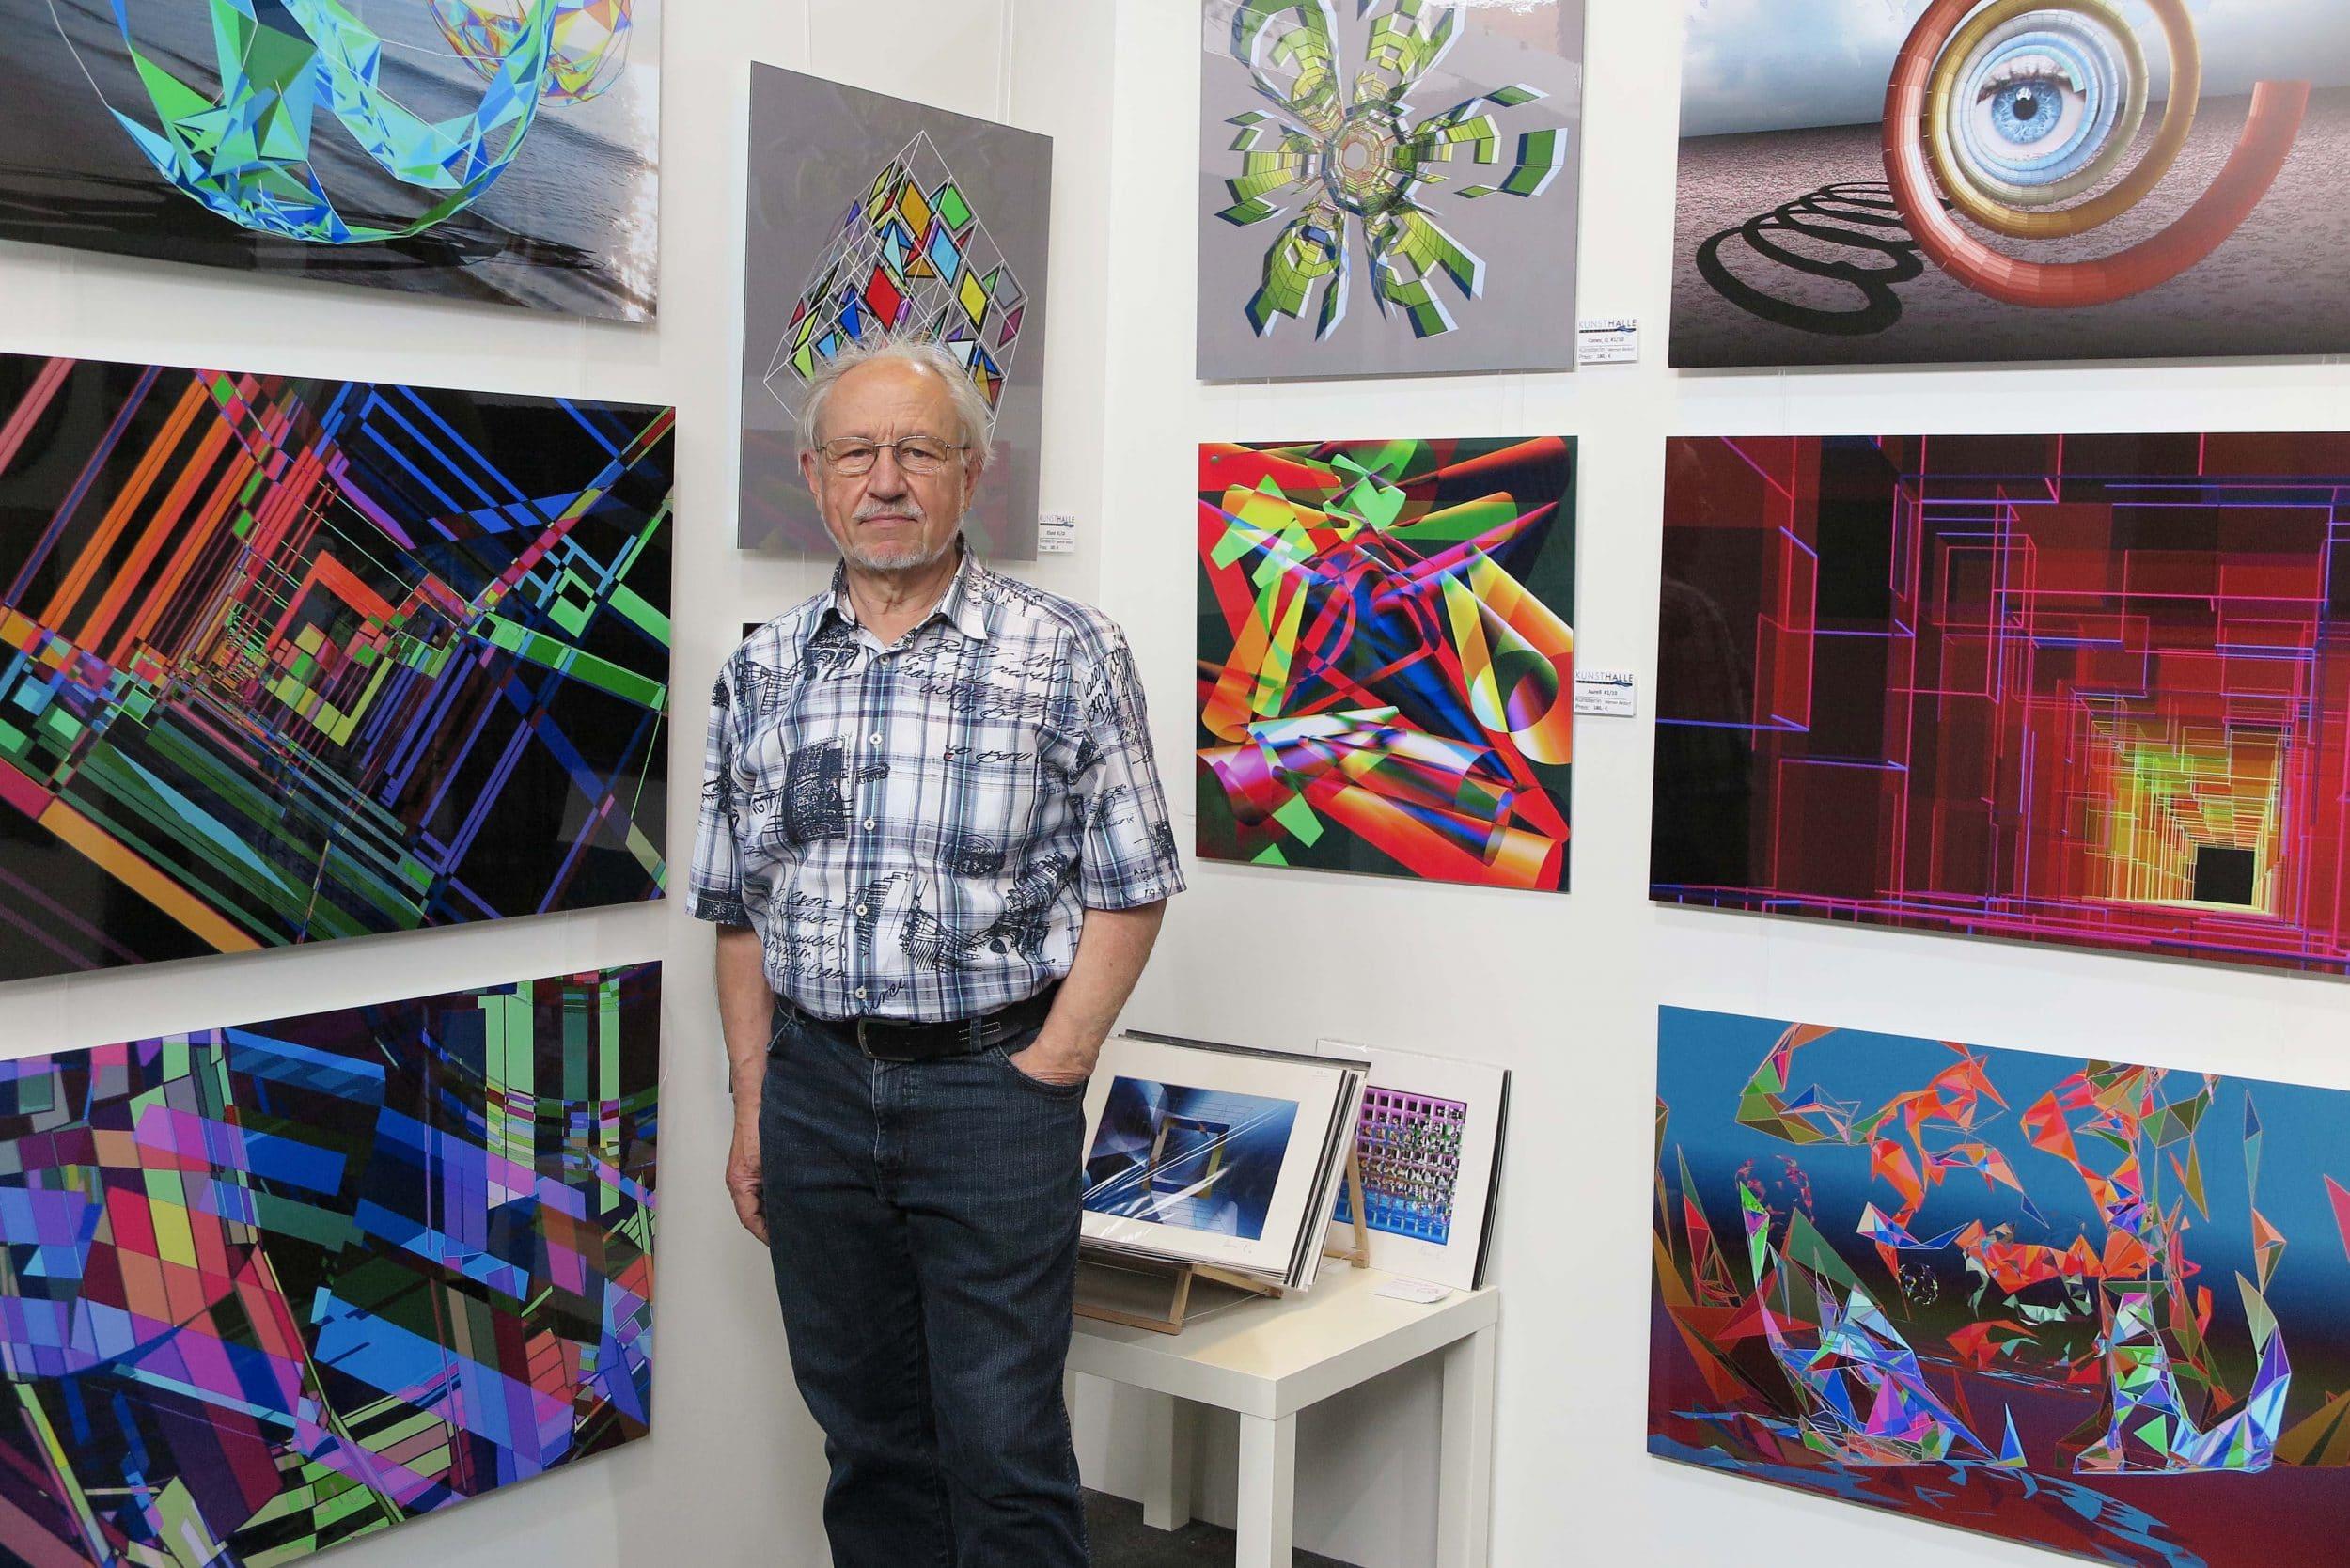 Werner Bedorf aus Hombruch zeigt digitale Kunst. (Fotos: IN-StadtMagazine)